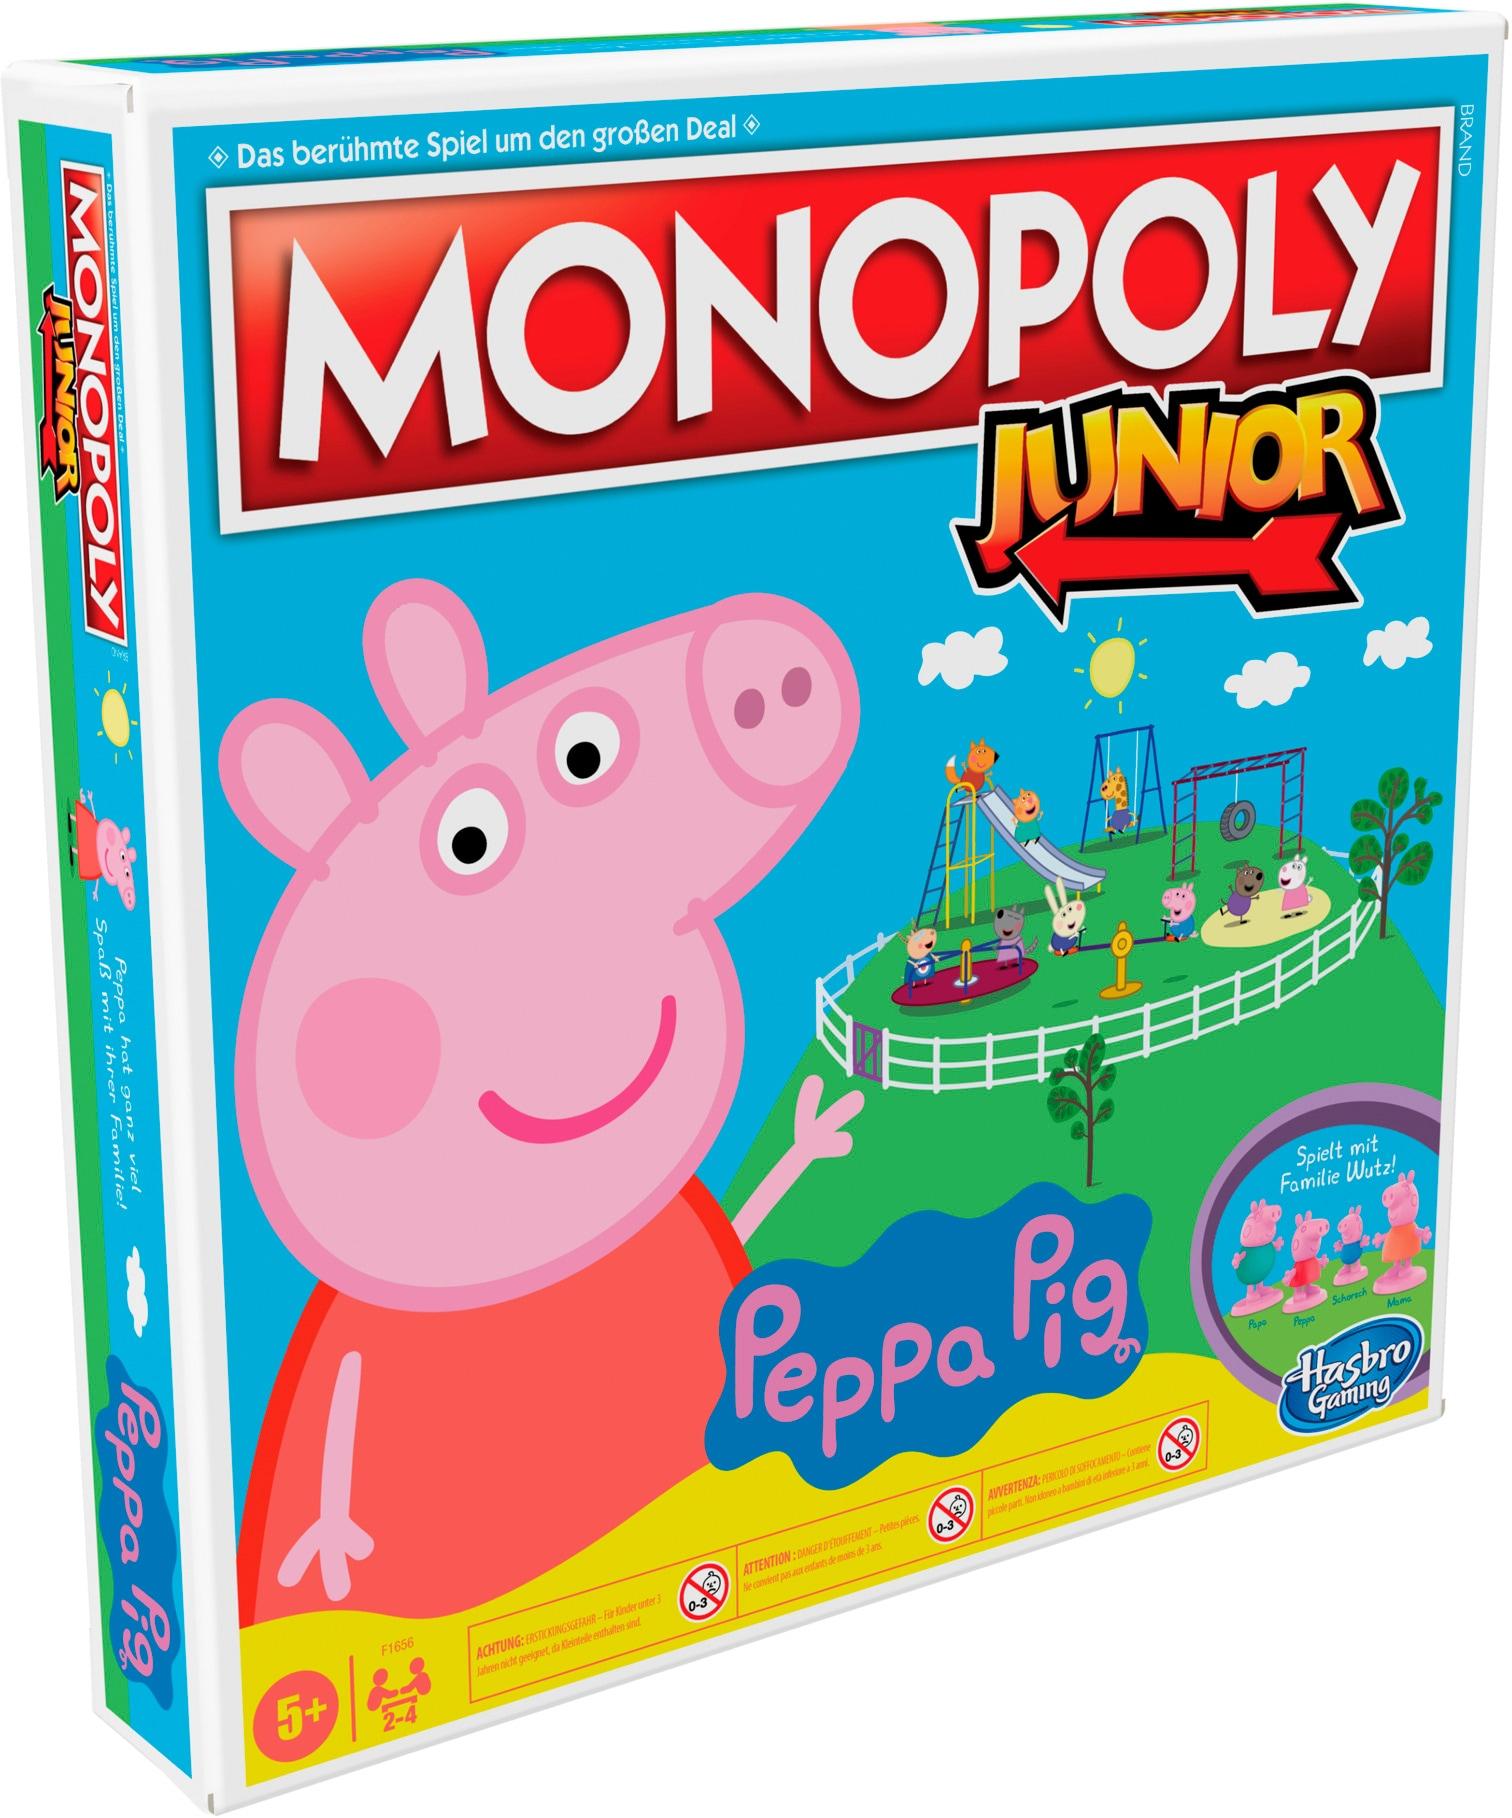 Hasbro Spiel Kinderspiel, Monopoly Junior: Peppa Pig bunt Kinder Spiele-Klassiker Gesellschaftsspiele